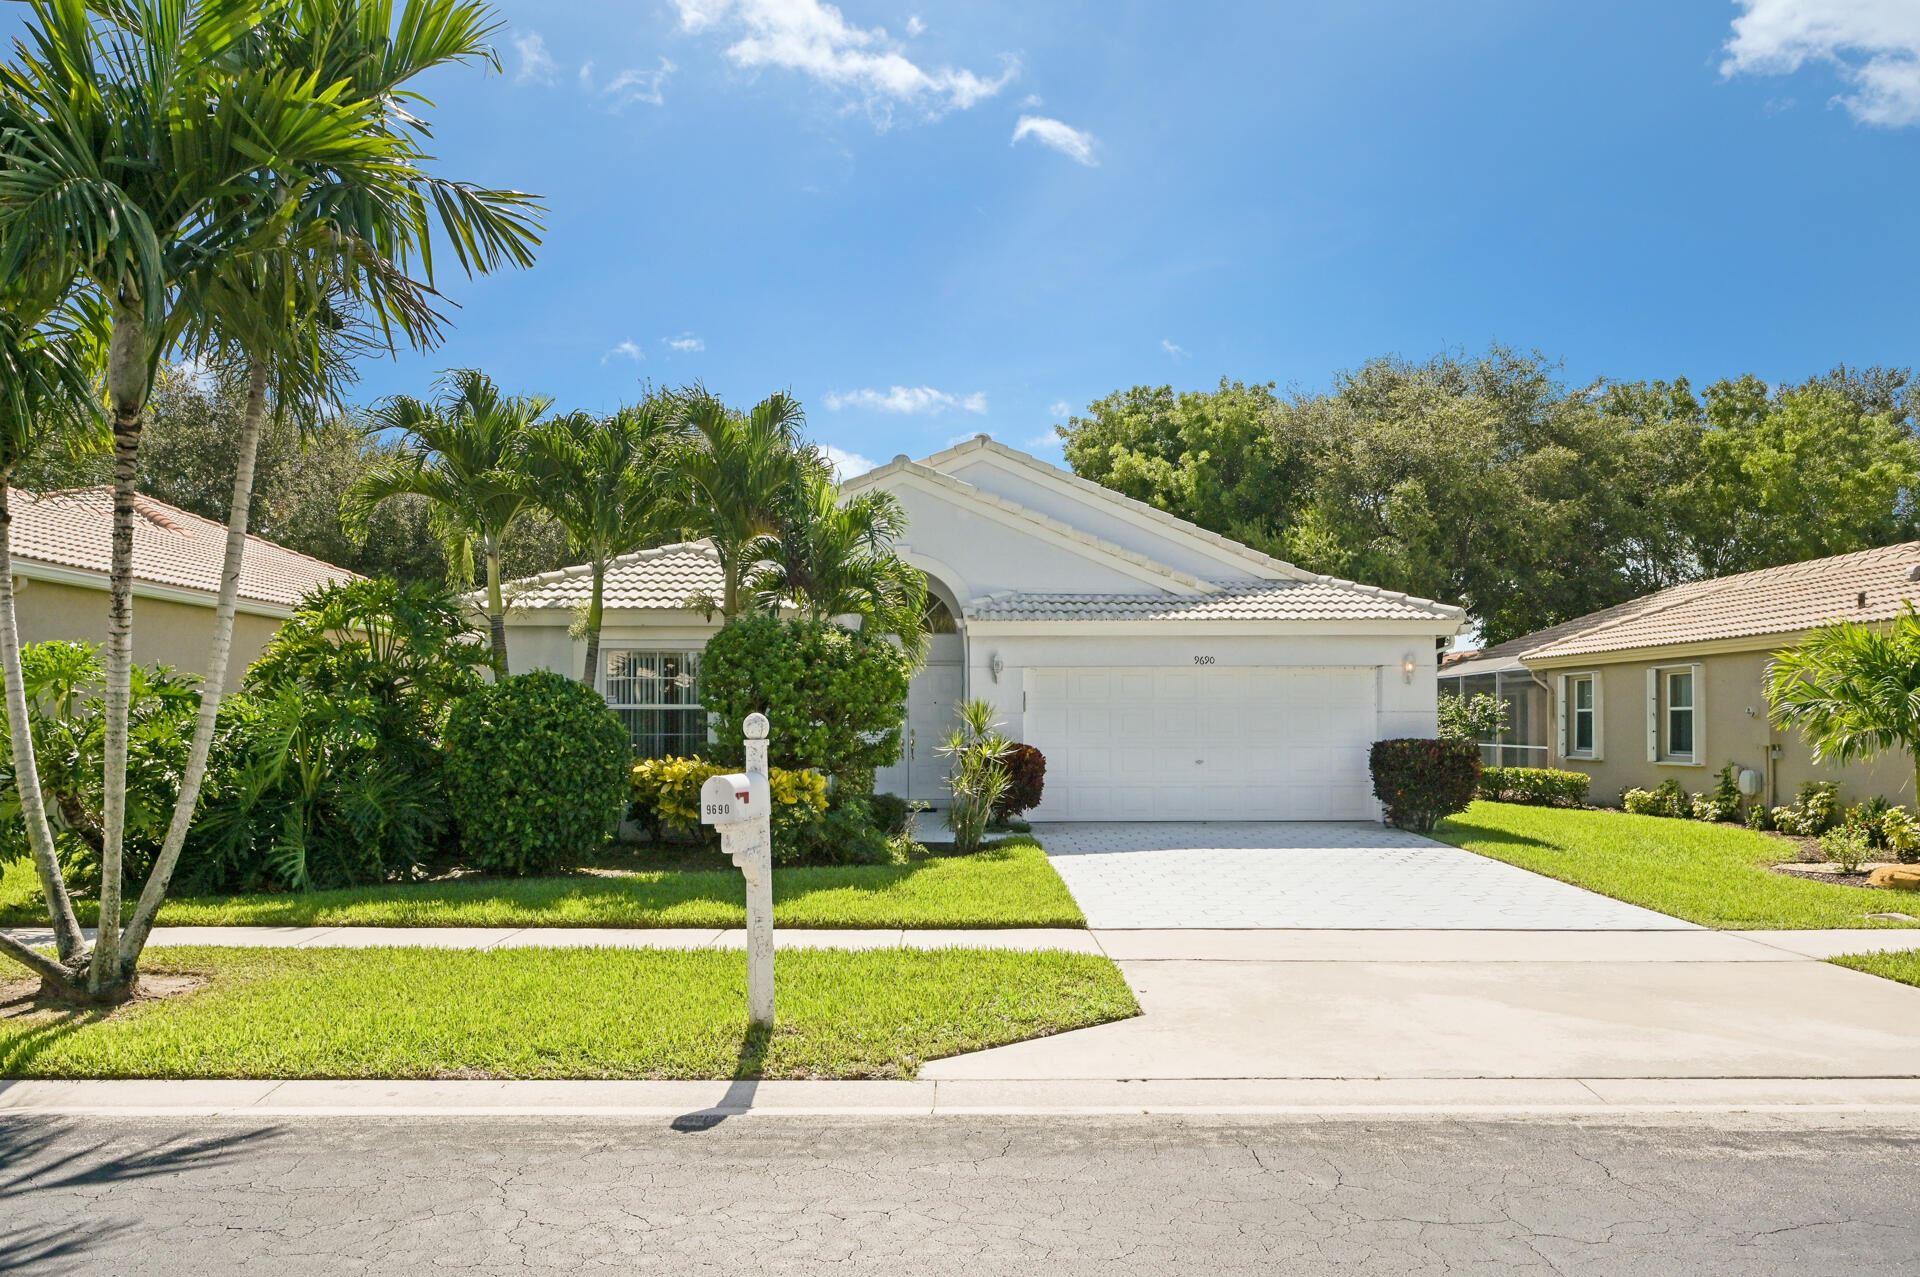 9690 Arbor View Drive N, Boynton Beach, FL 33437 - MLS#: RX-10729710